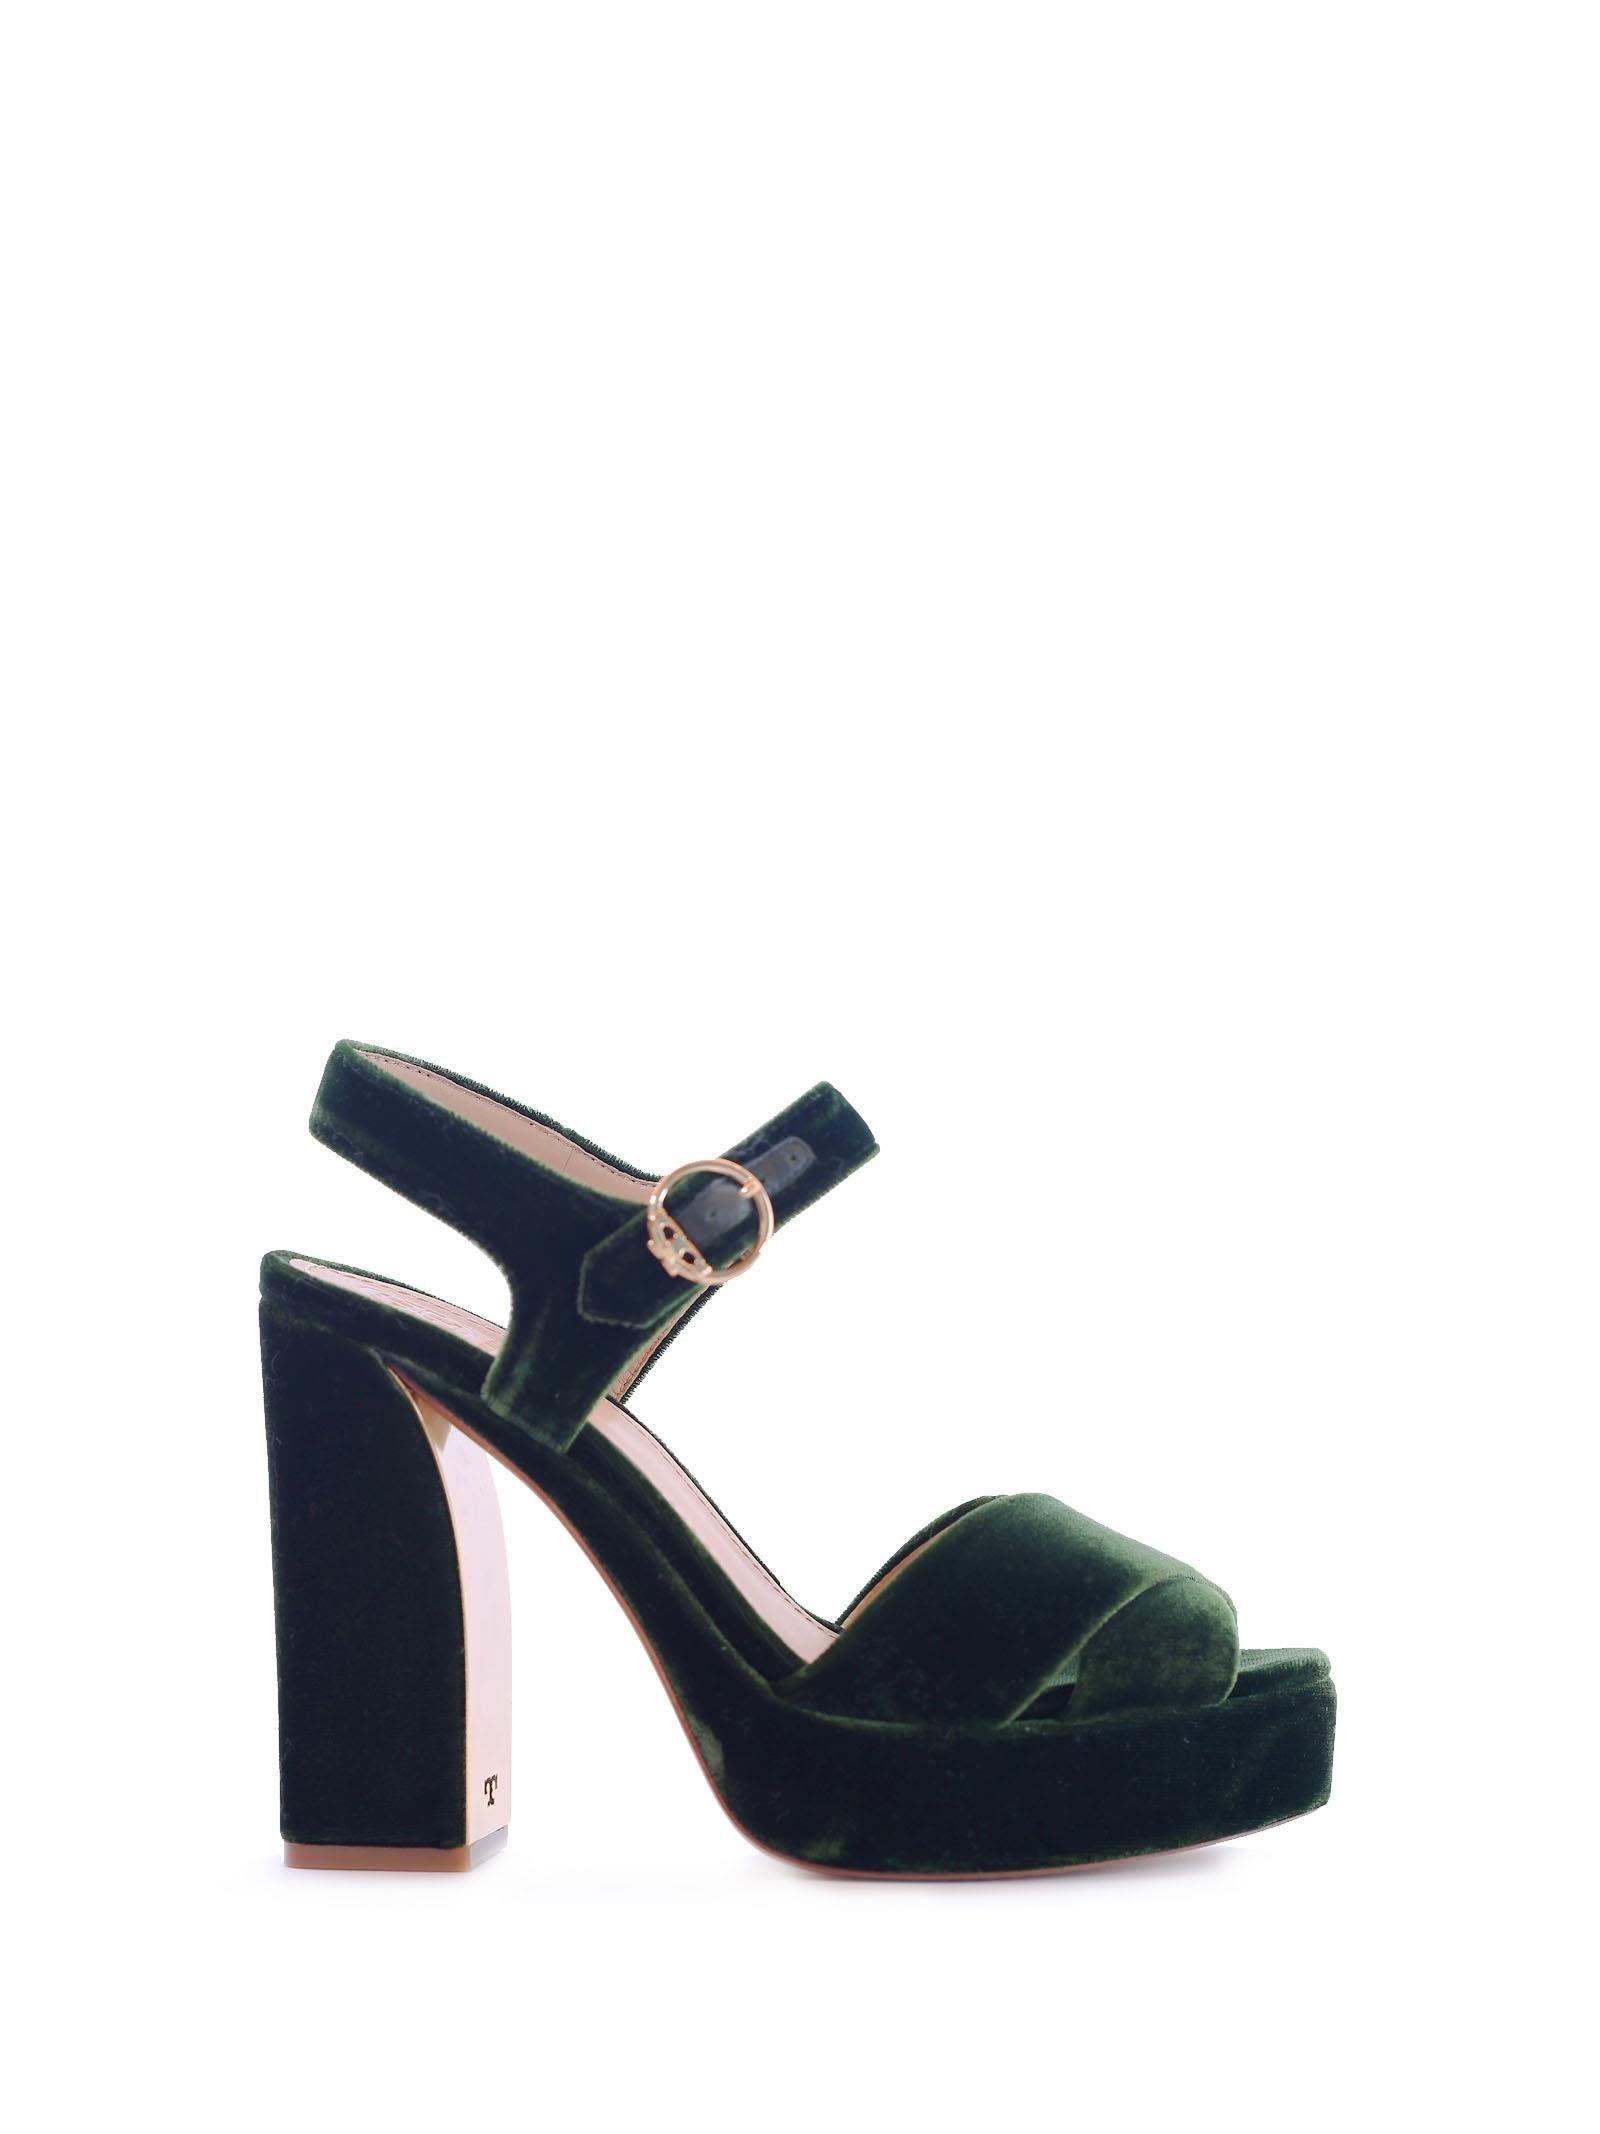 661ee794871 TORY BURCH LORETTA PLATFORM SANDAL.  toryburch  shoes